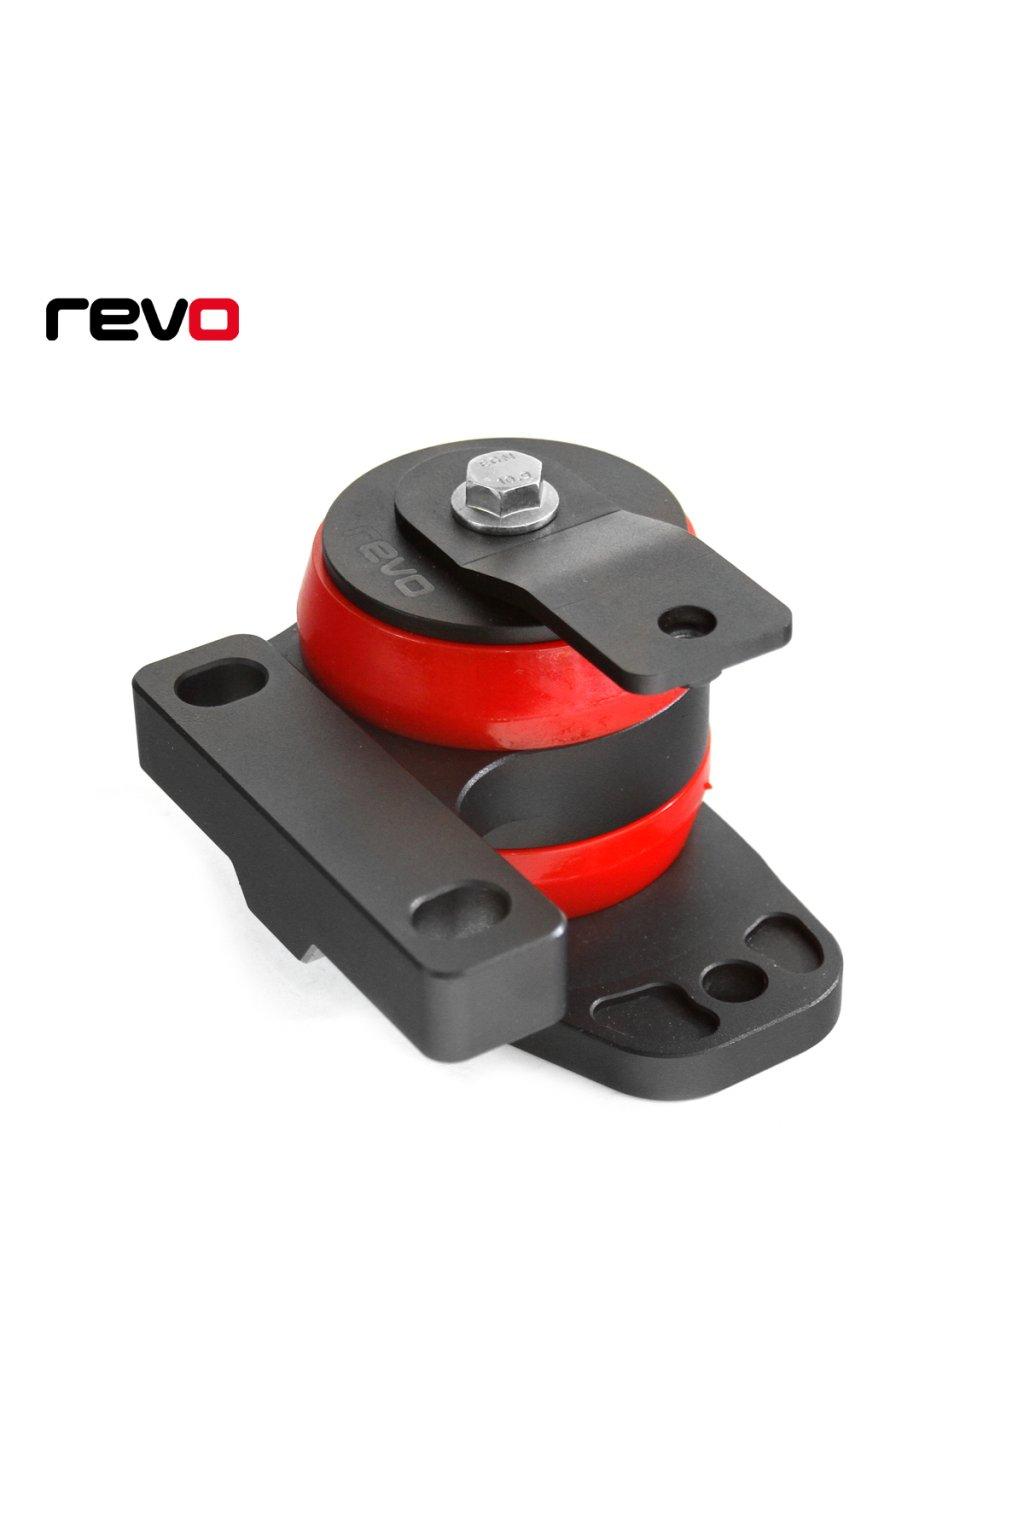 Revo MK5/6 Engine Mount